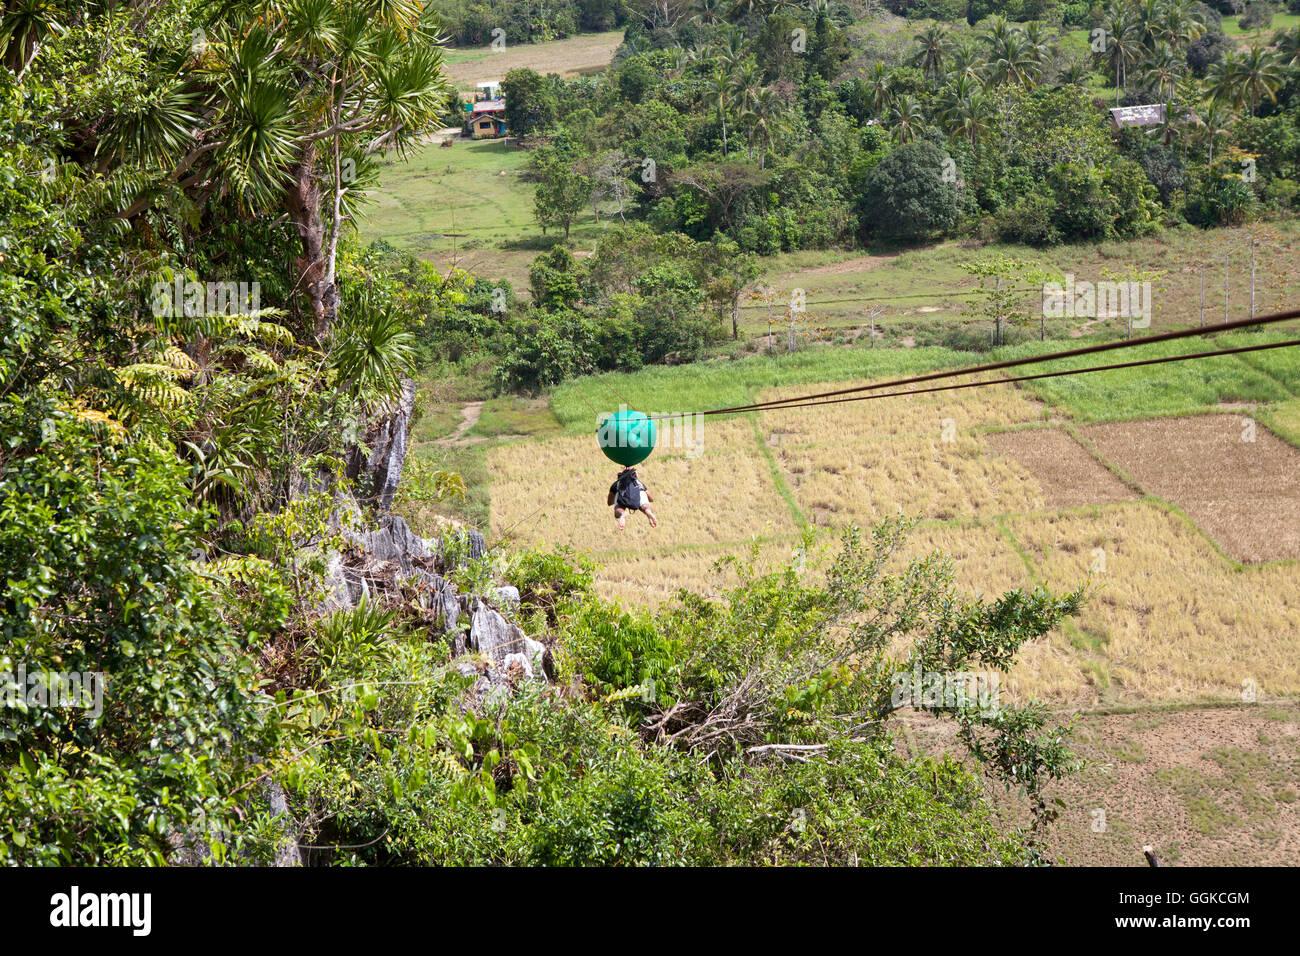 Zipline gliding on the west coast of Palawan Island, Philippines, Asia - Stock Image